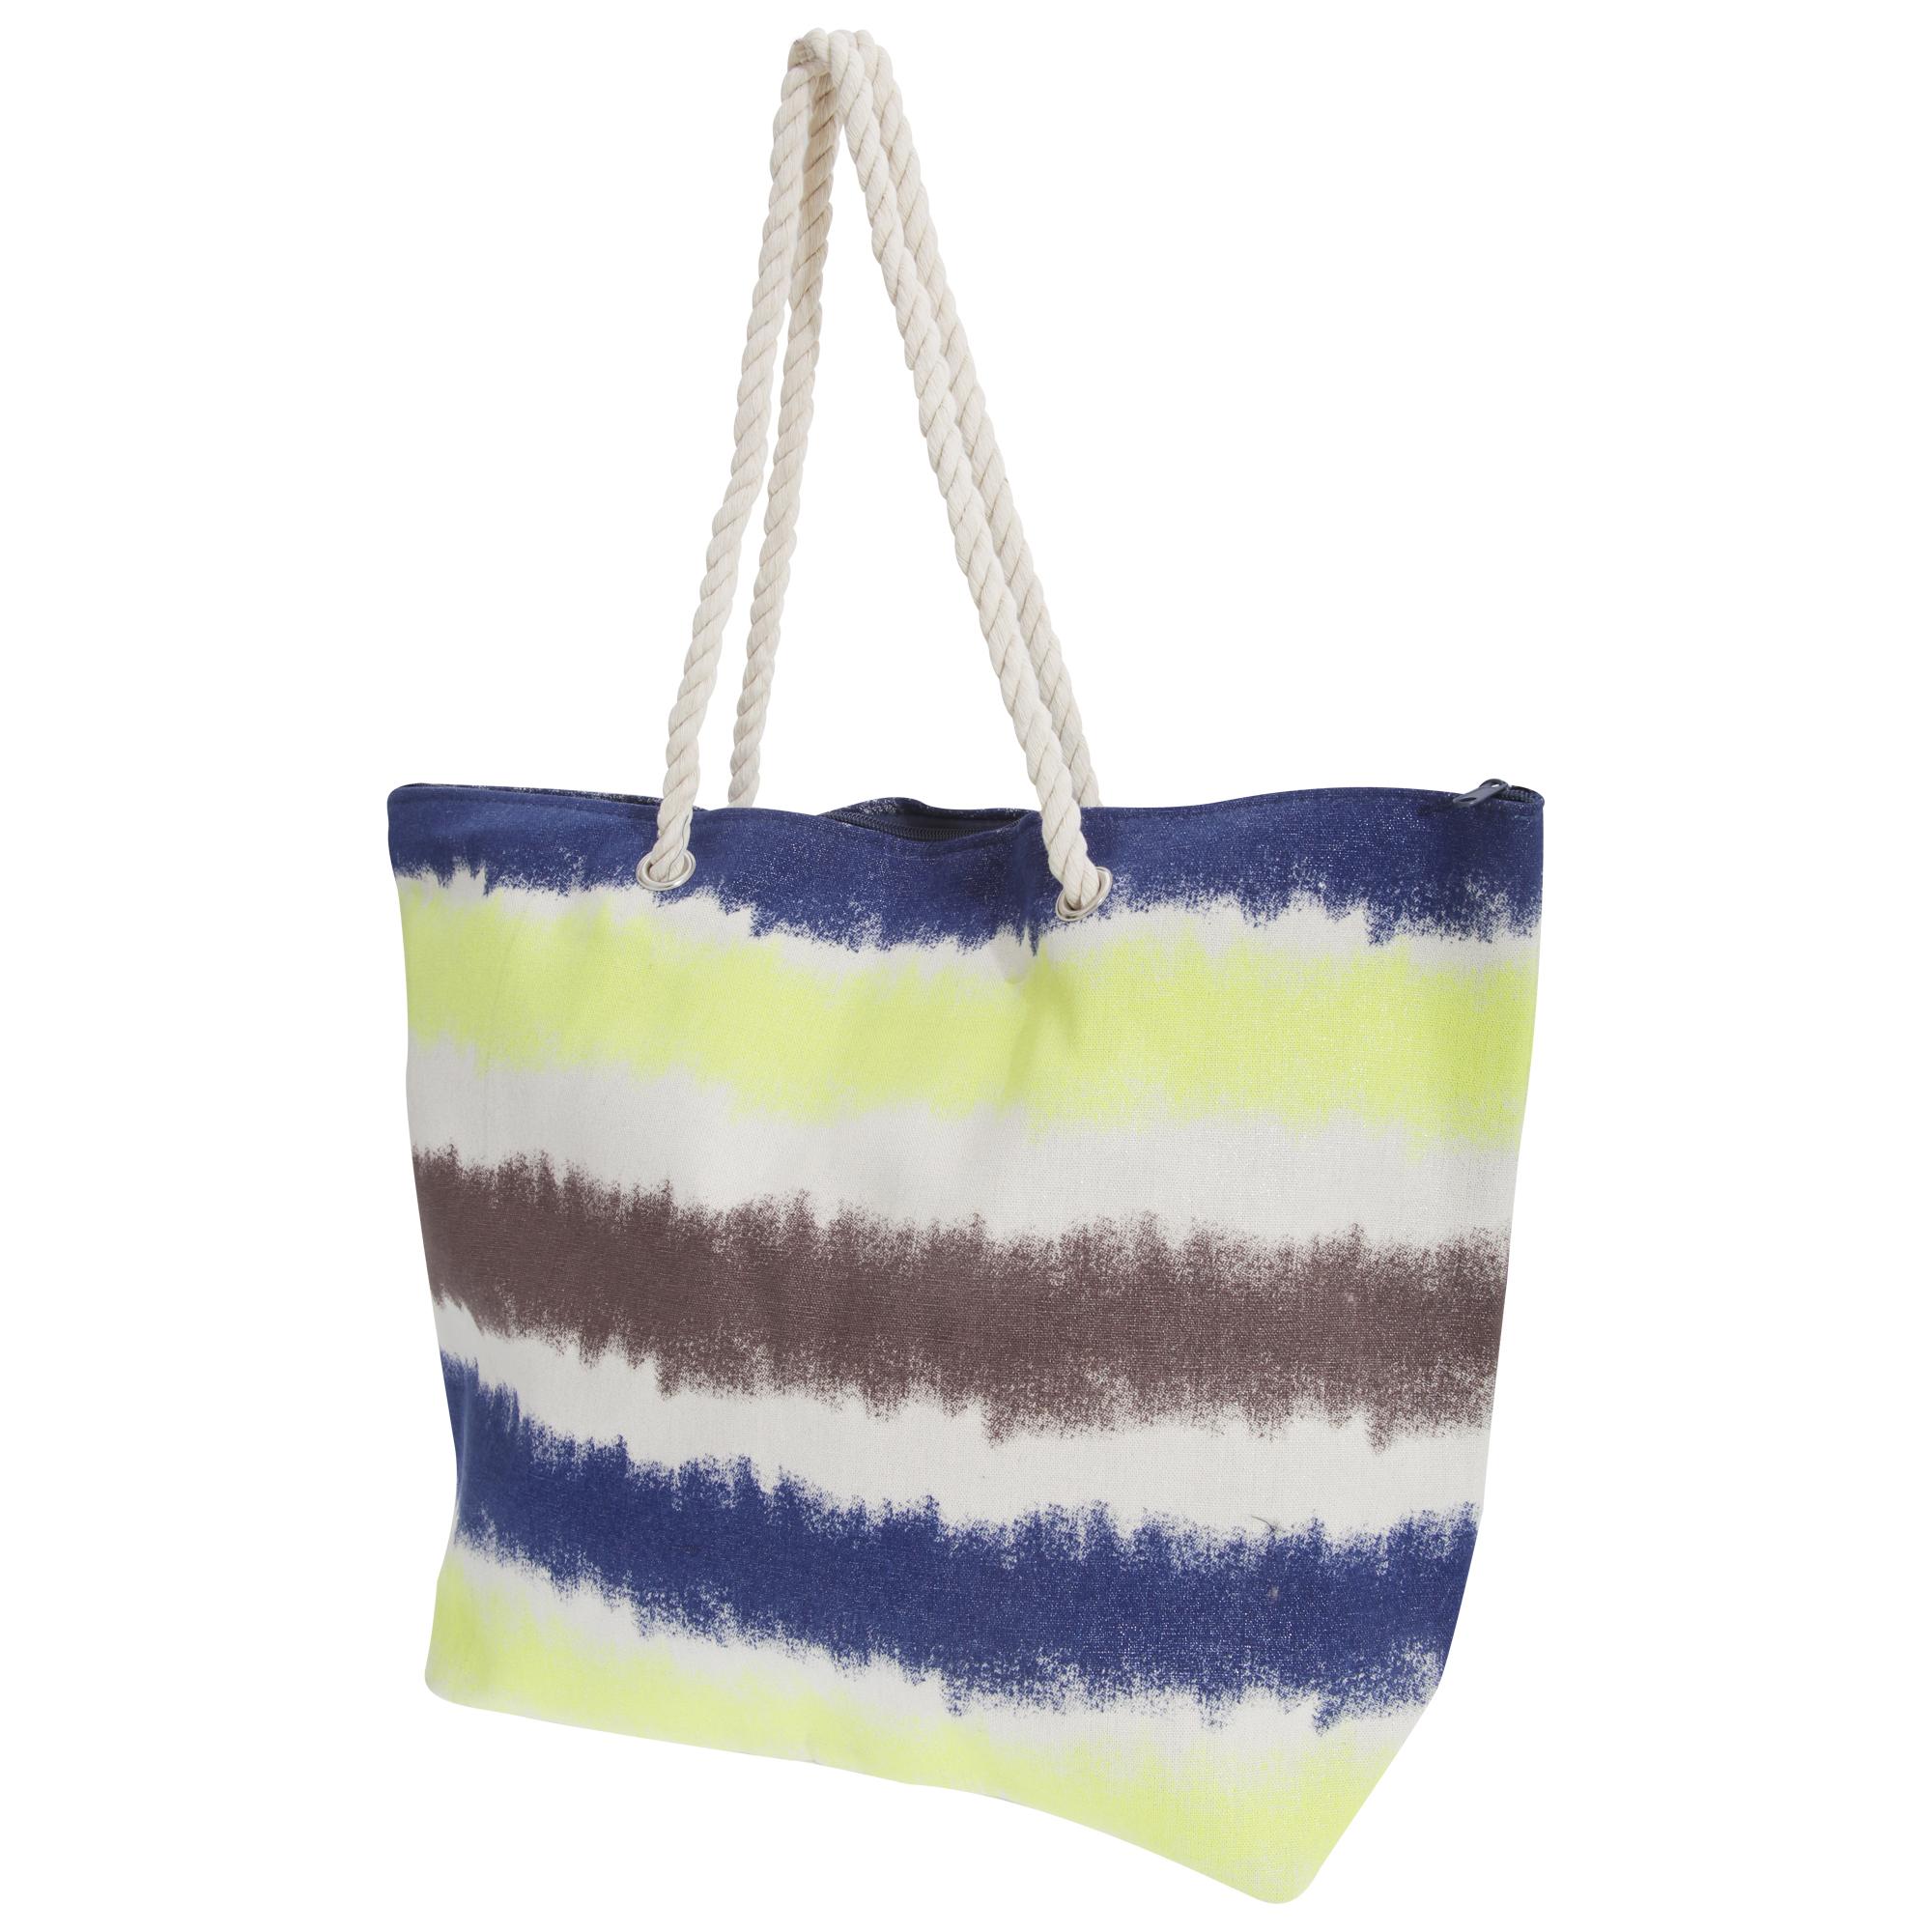 FLOSO Womens/Ladies Faded Stripe Design Canvas Summer Handbag (One Size) (Yellow/Navy/Brown/Blue)